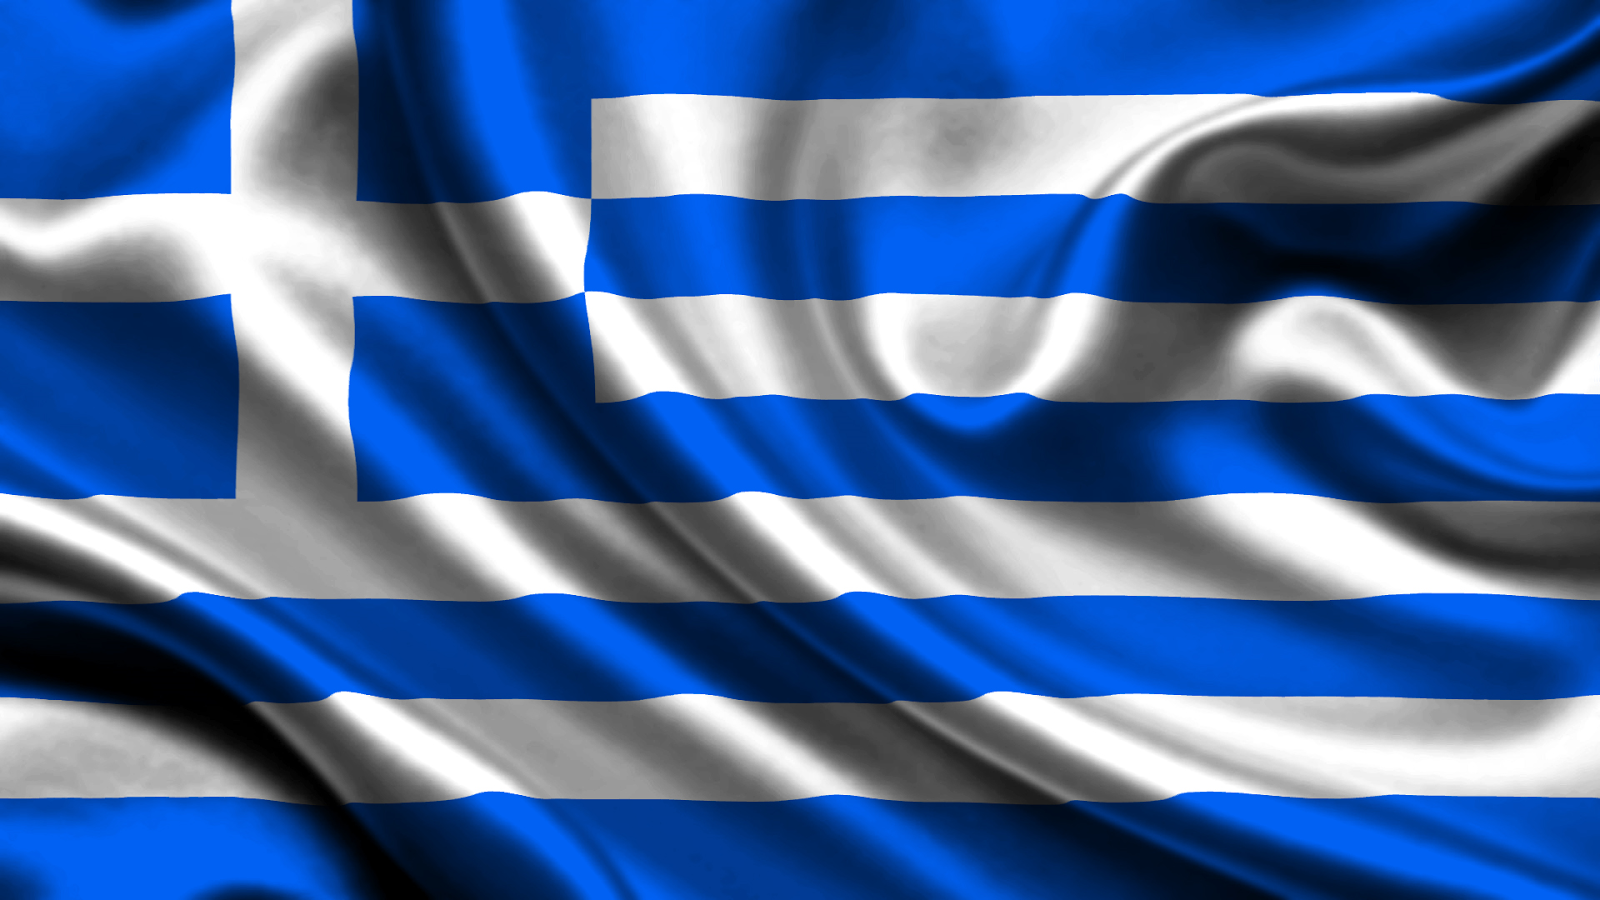 National Anthem - Greece - στιγμιότυπο οθόνης